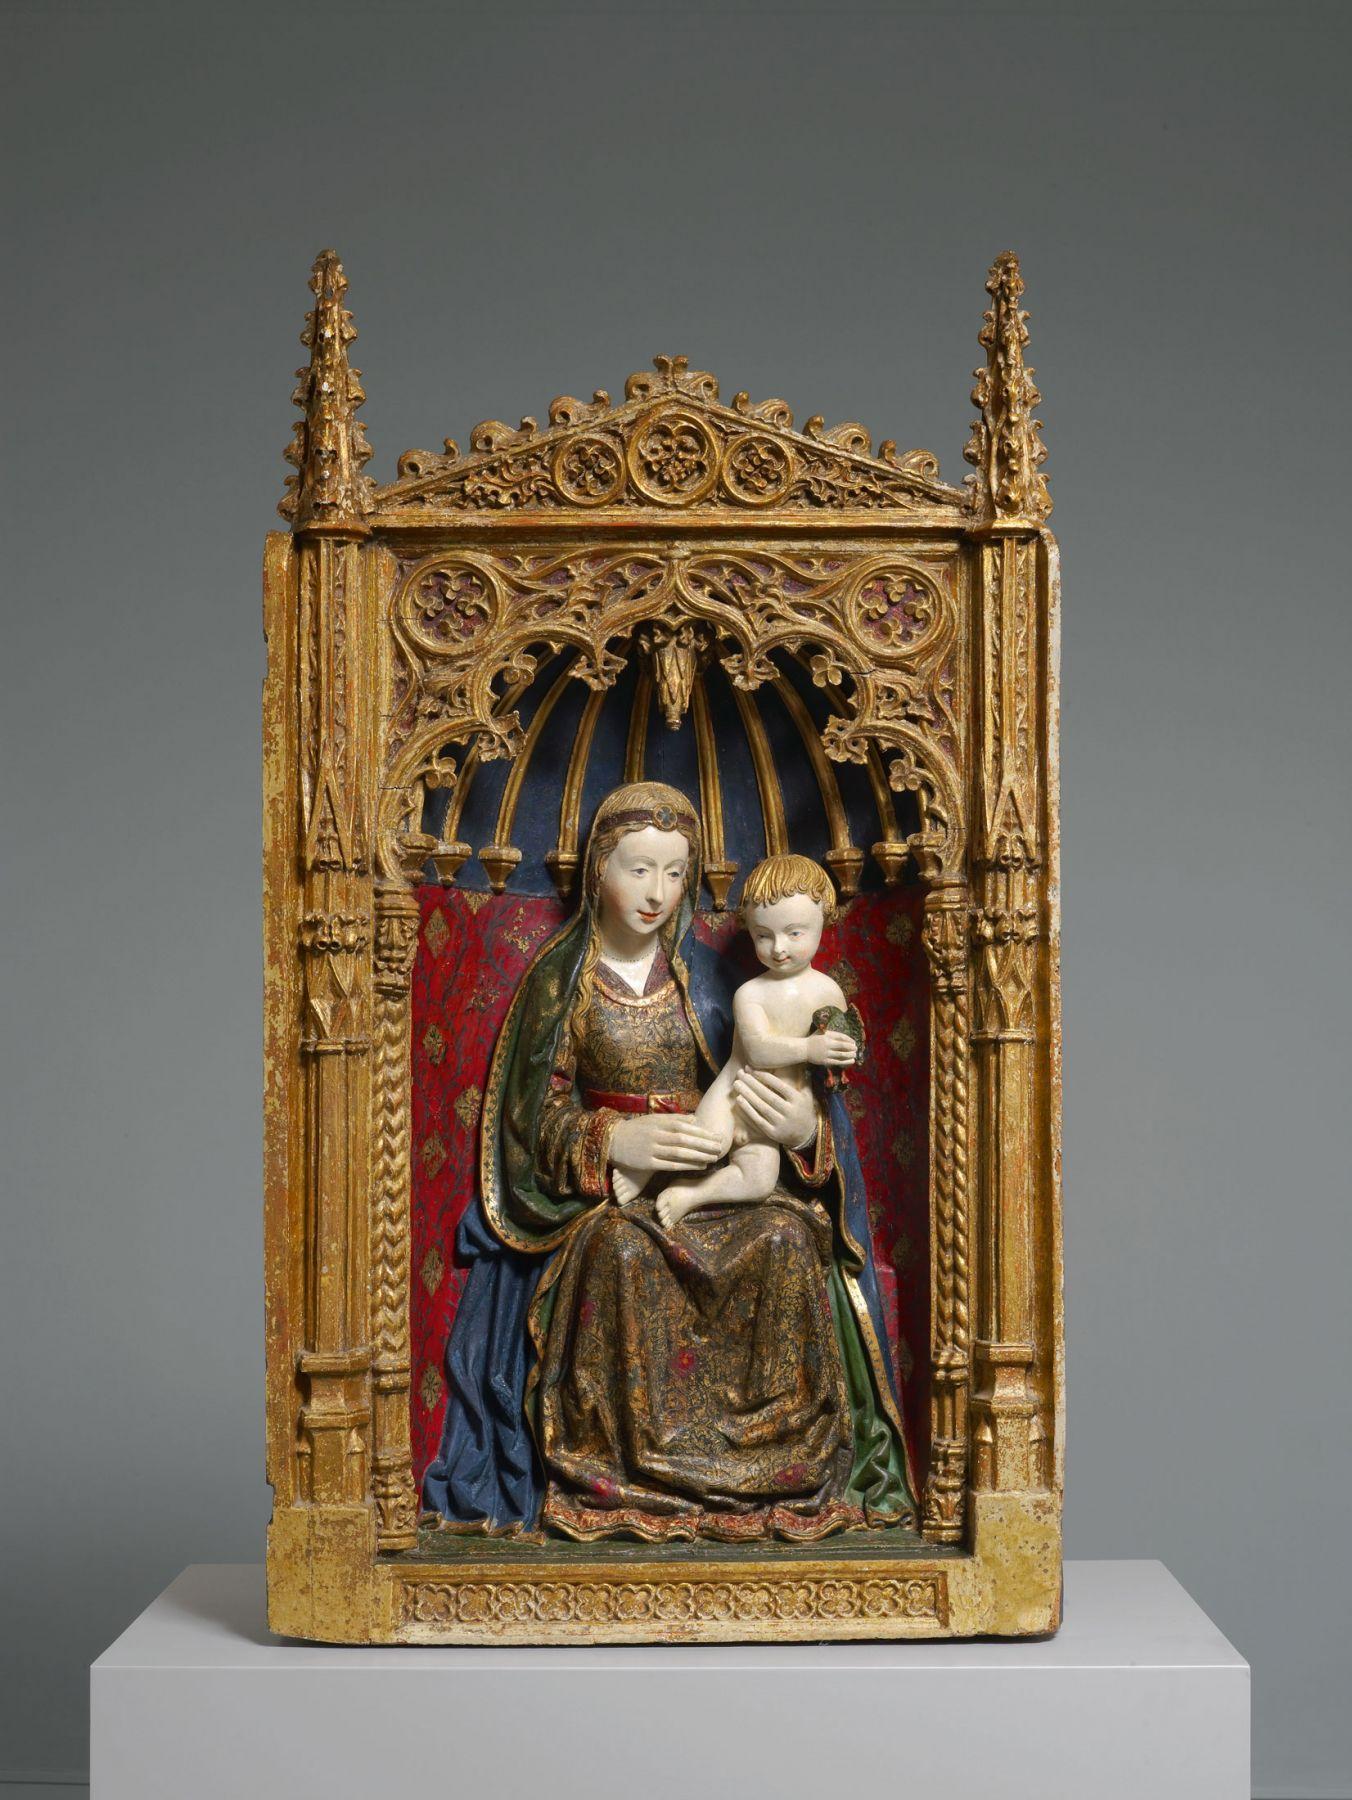 Workshop ofGil de Siloé(c. 1440-1501) andDiego de la Cruz(fl. 1482-1500), A gilded shrine showing the Virgin and Child